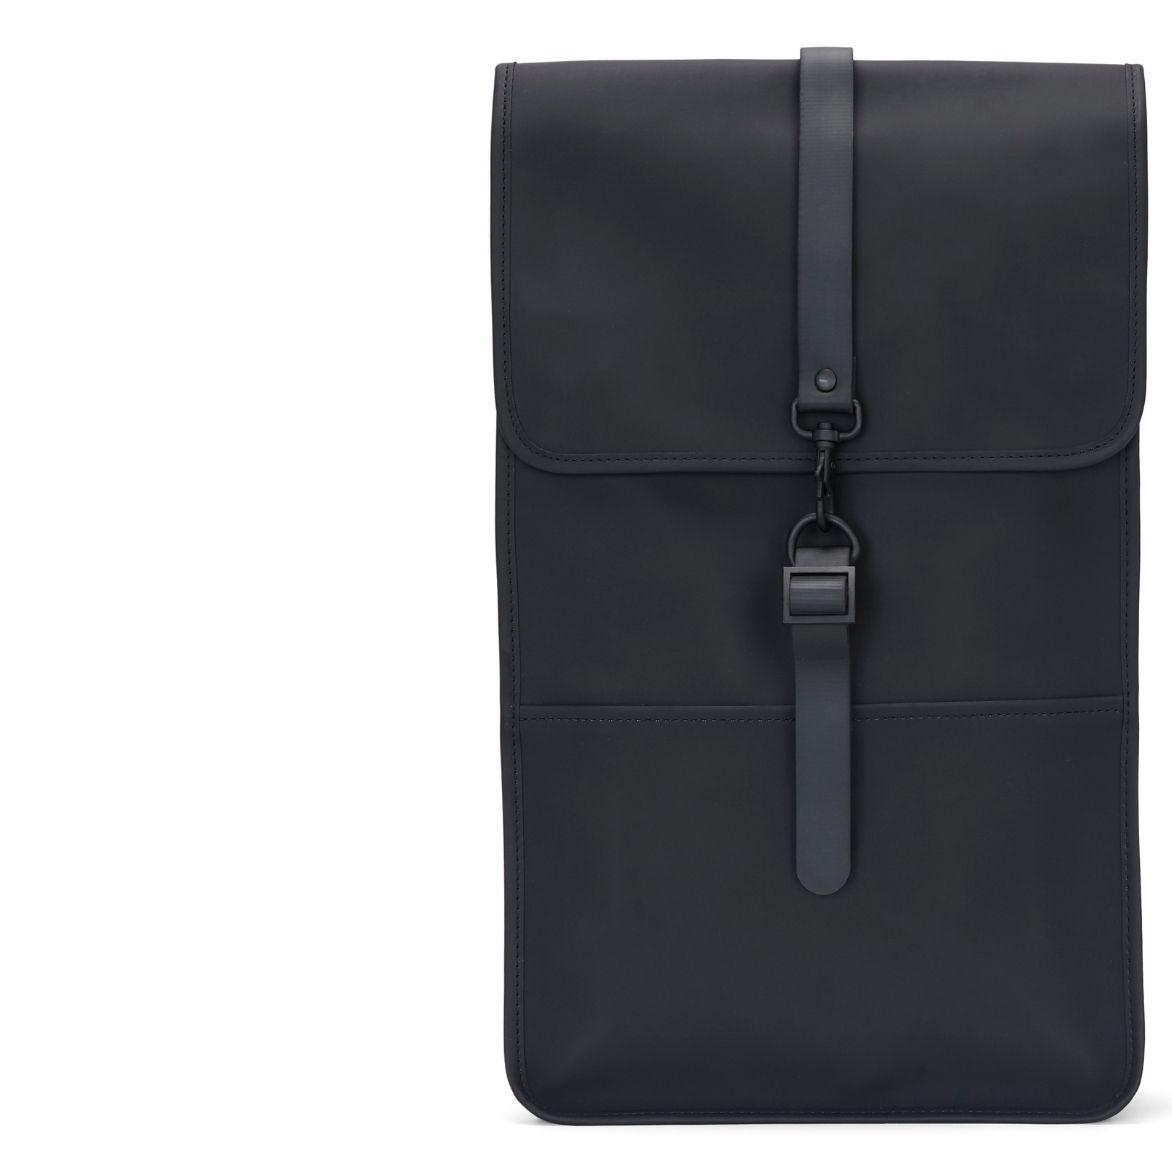 Rains Backpack Black – waterproof stylish backpacks at WATCH WEAR online store